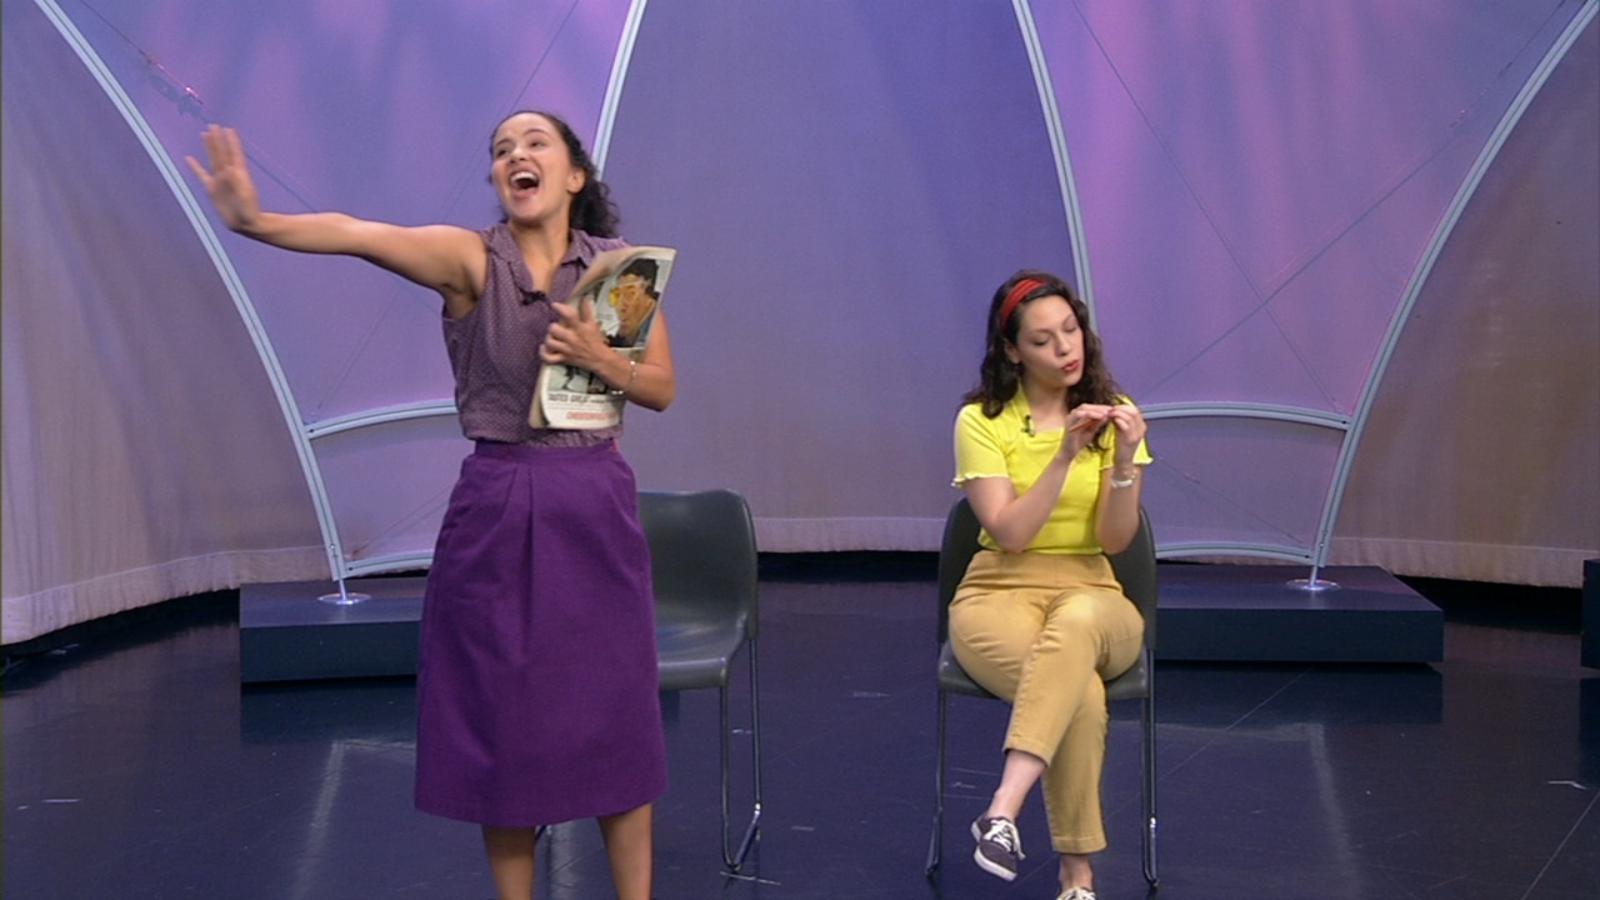 Destinos Festival: Celebrating Latinos in theater